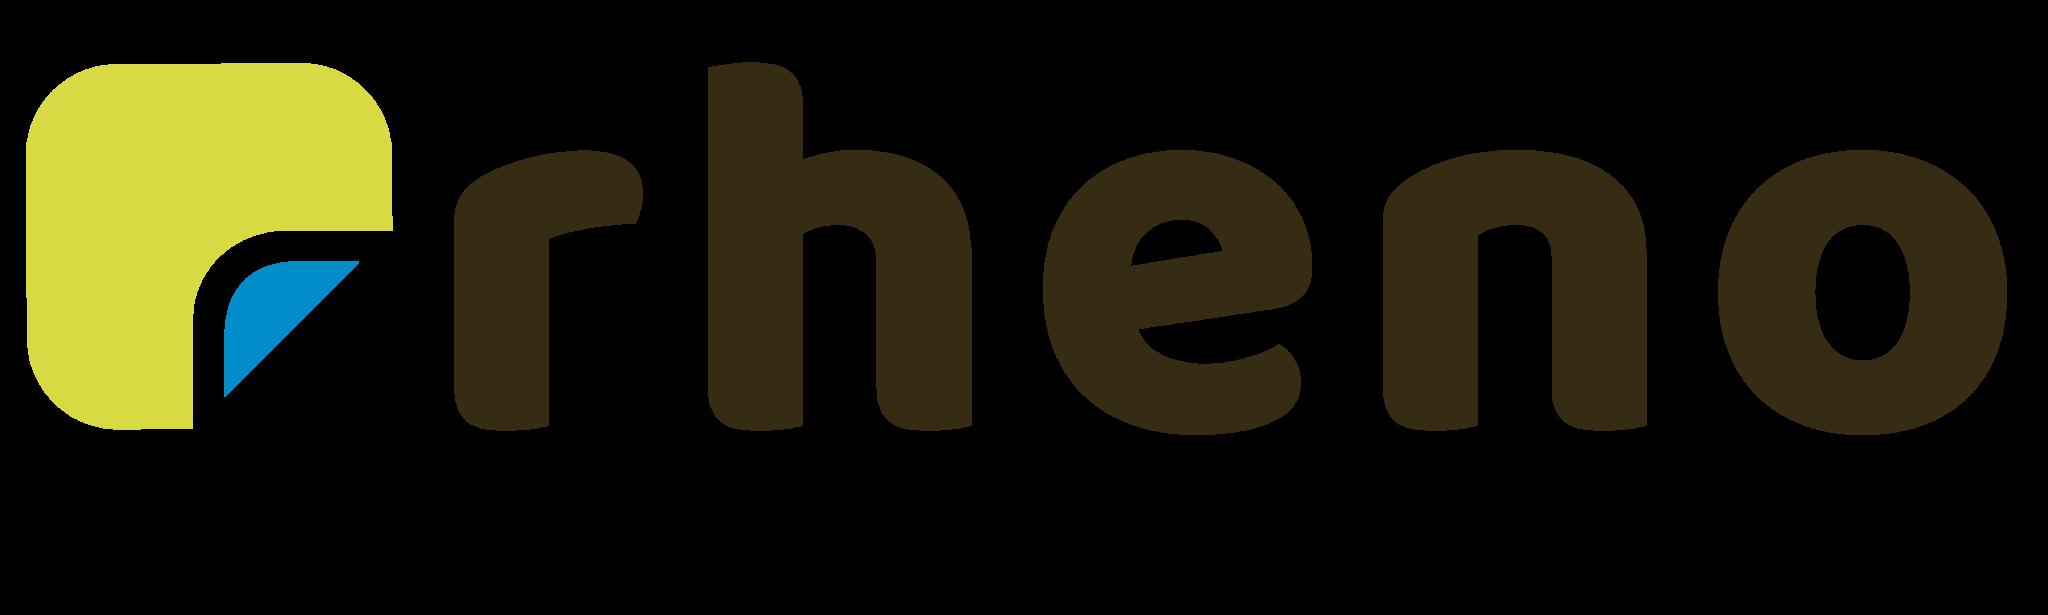 Logo-rheno-Pantones-conversion-quadire-01